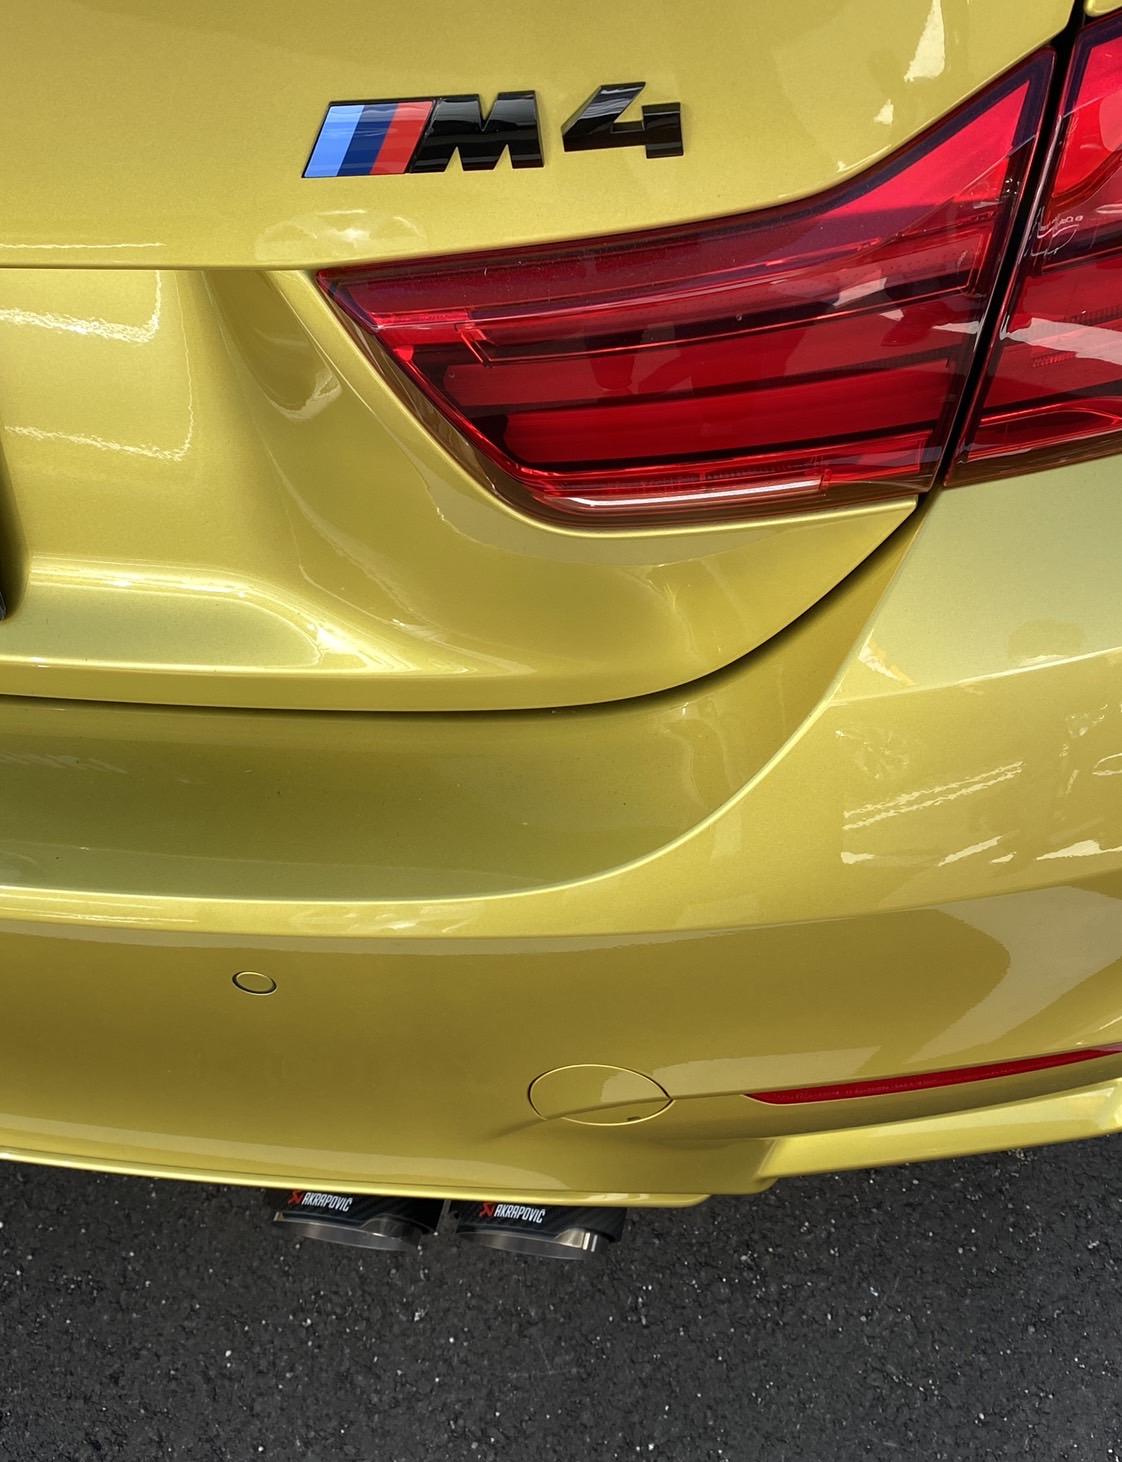 BMW M4 AKRAROVIC スリップオンラインマフラー交換